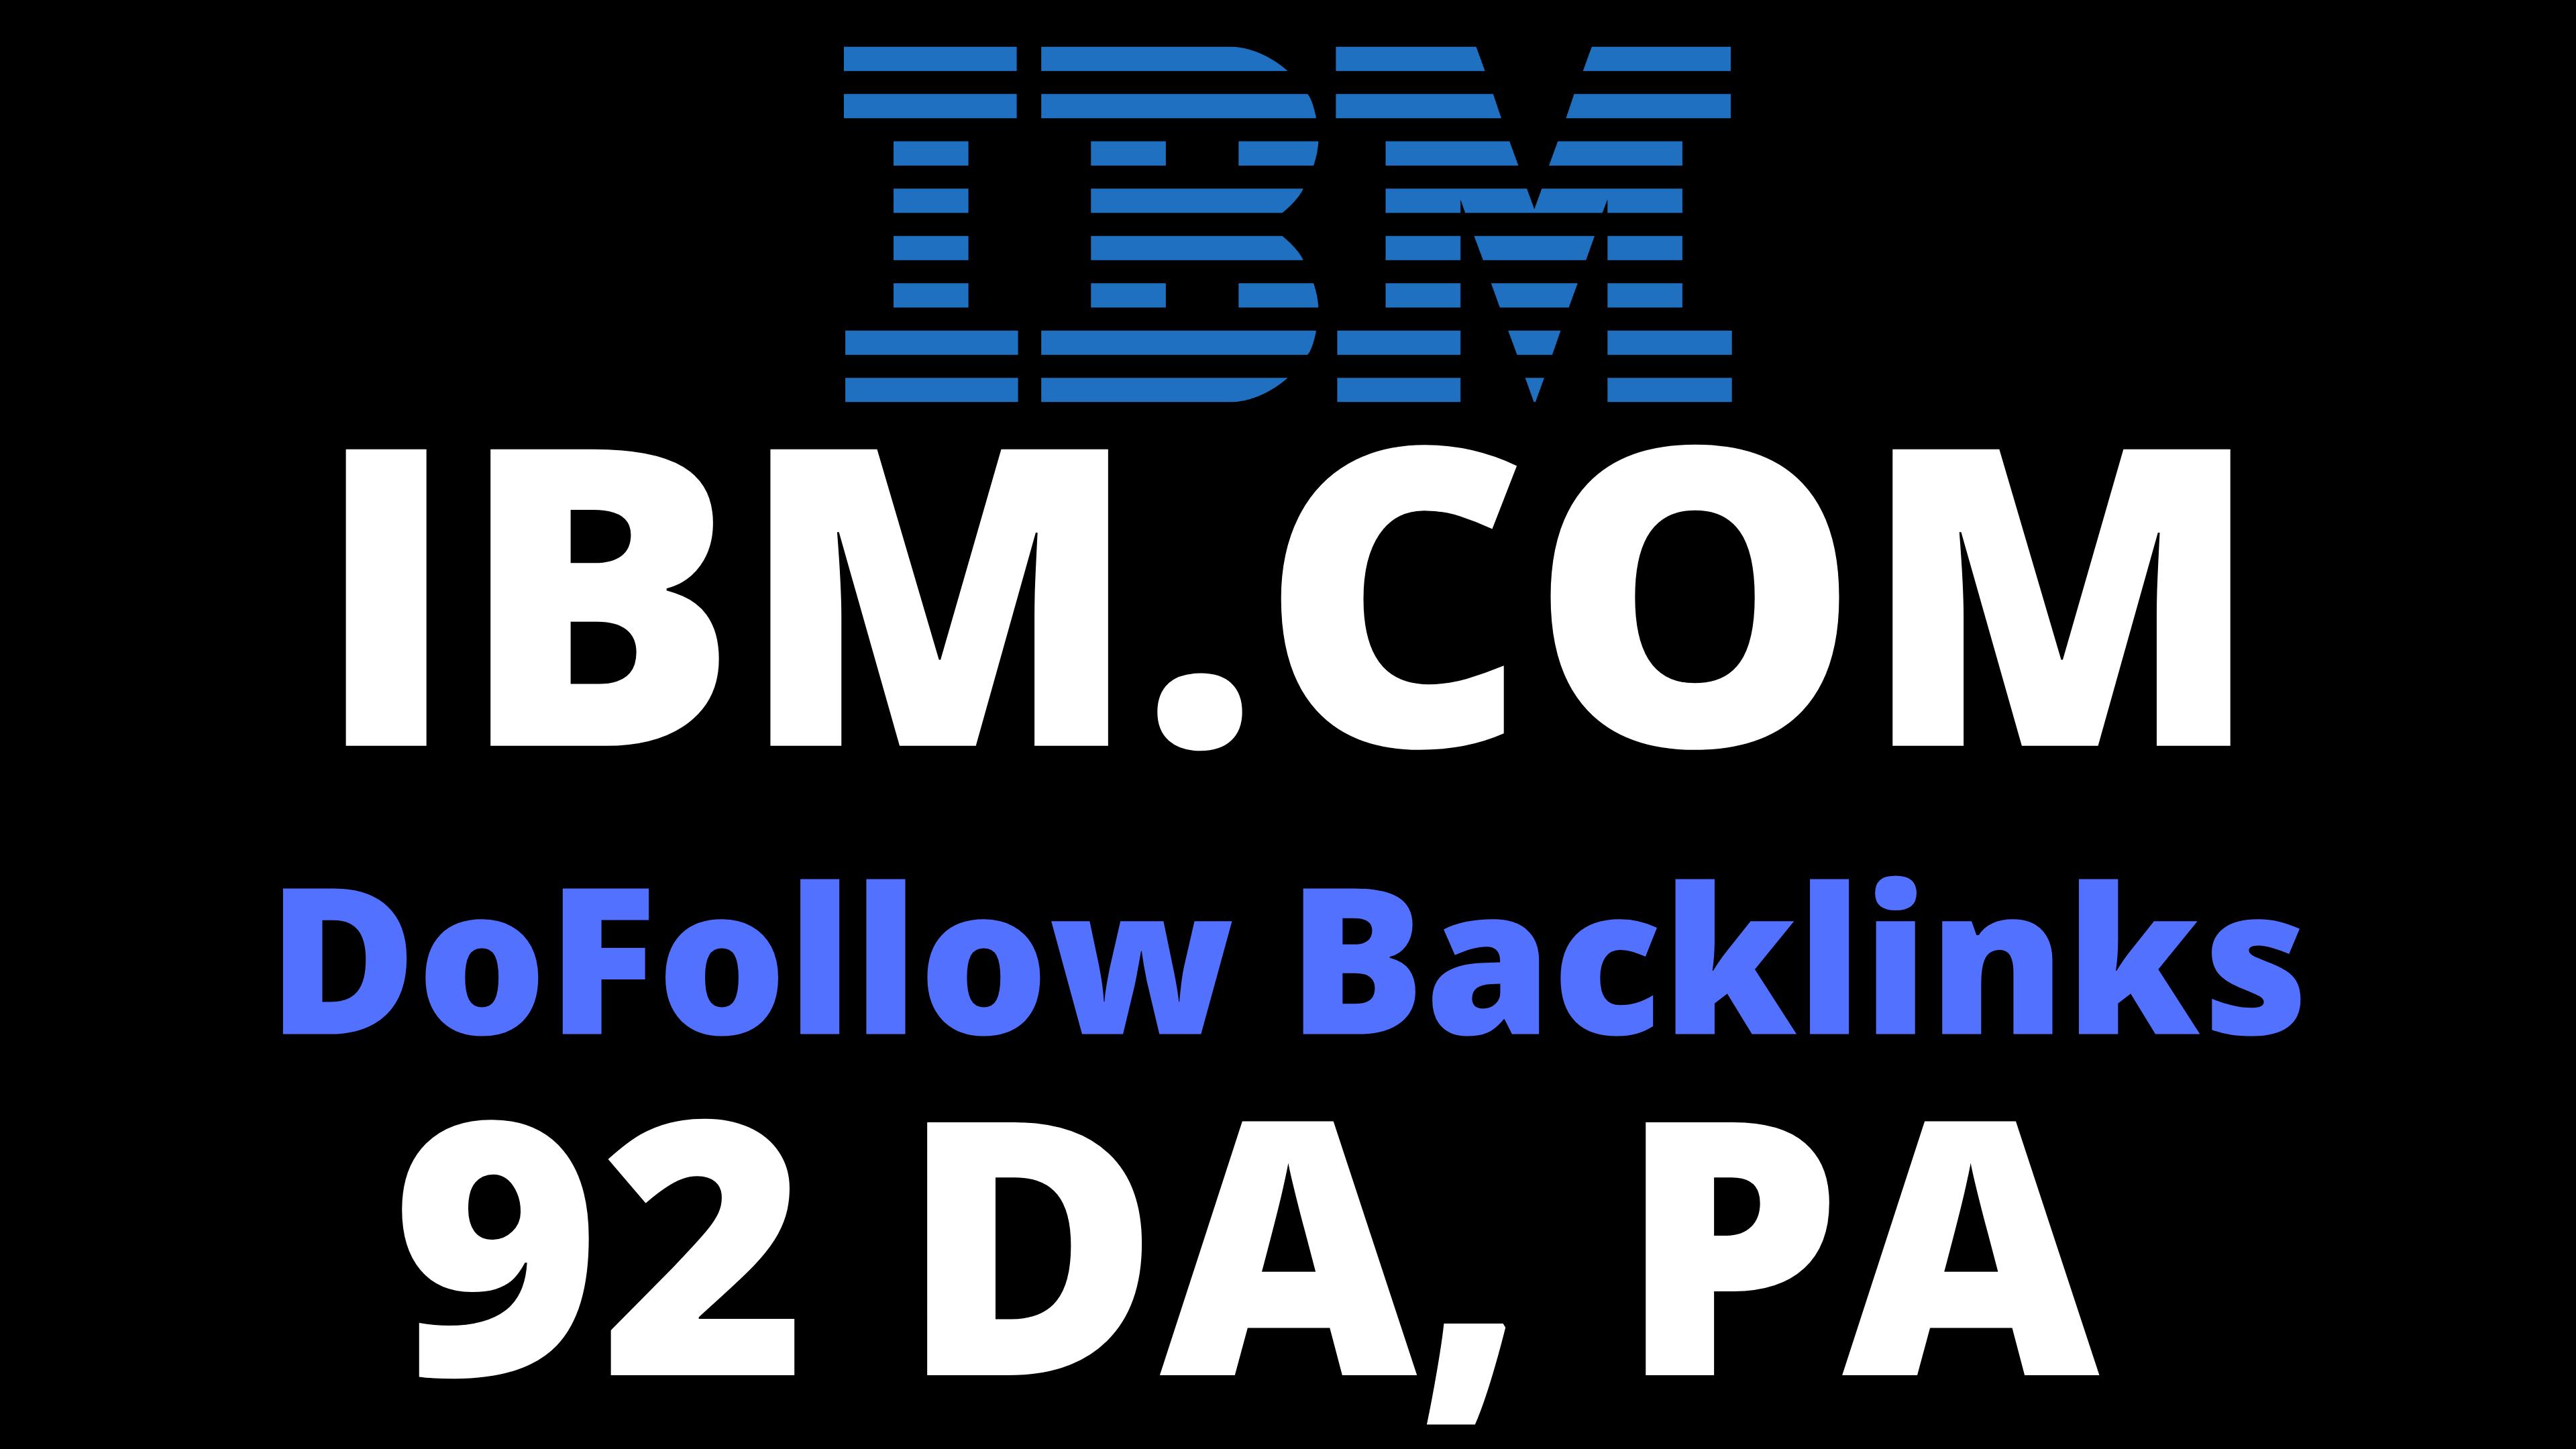 IBM 1 Dofollow Backlink High Quality 92 DA and PA White Hat SEO